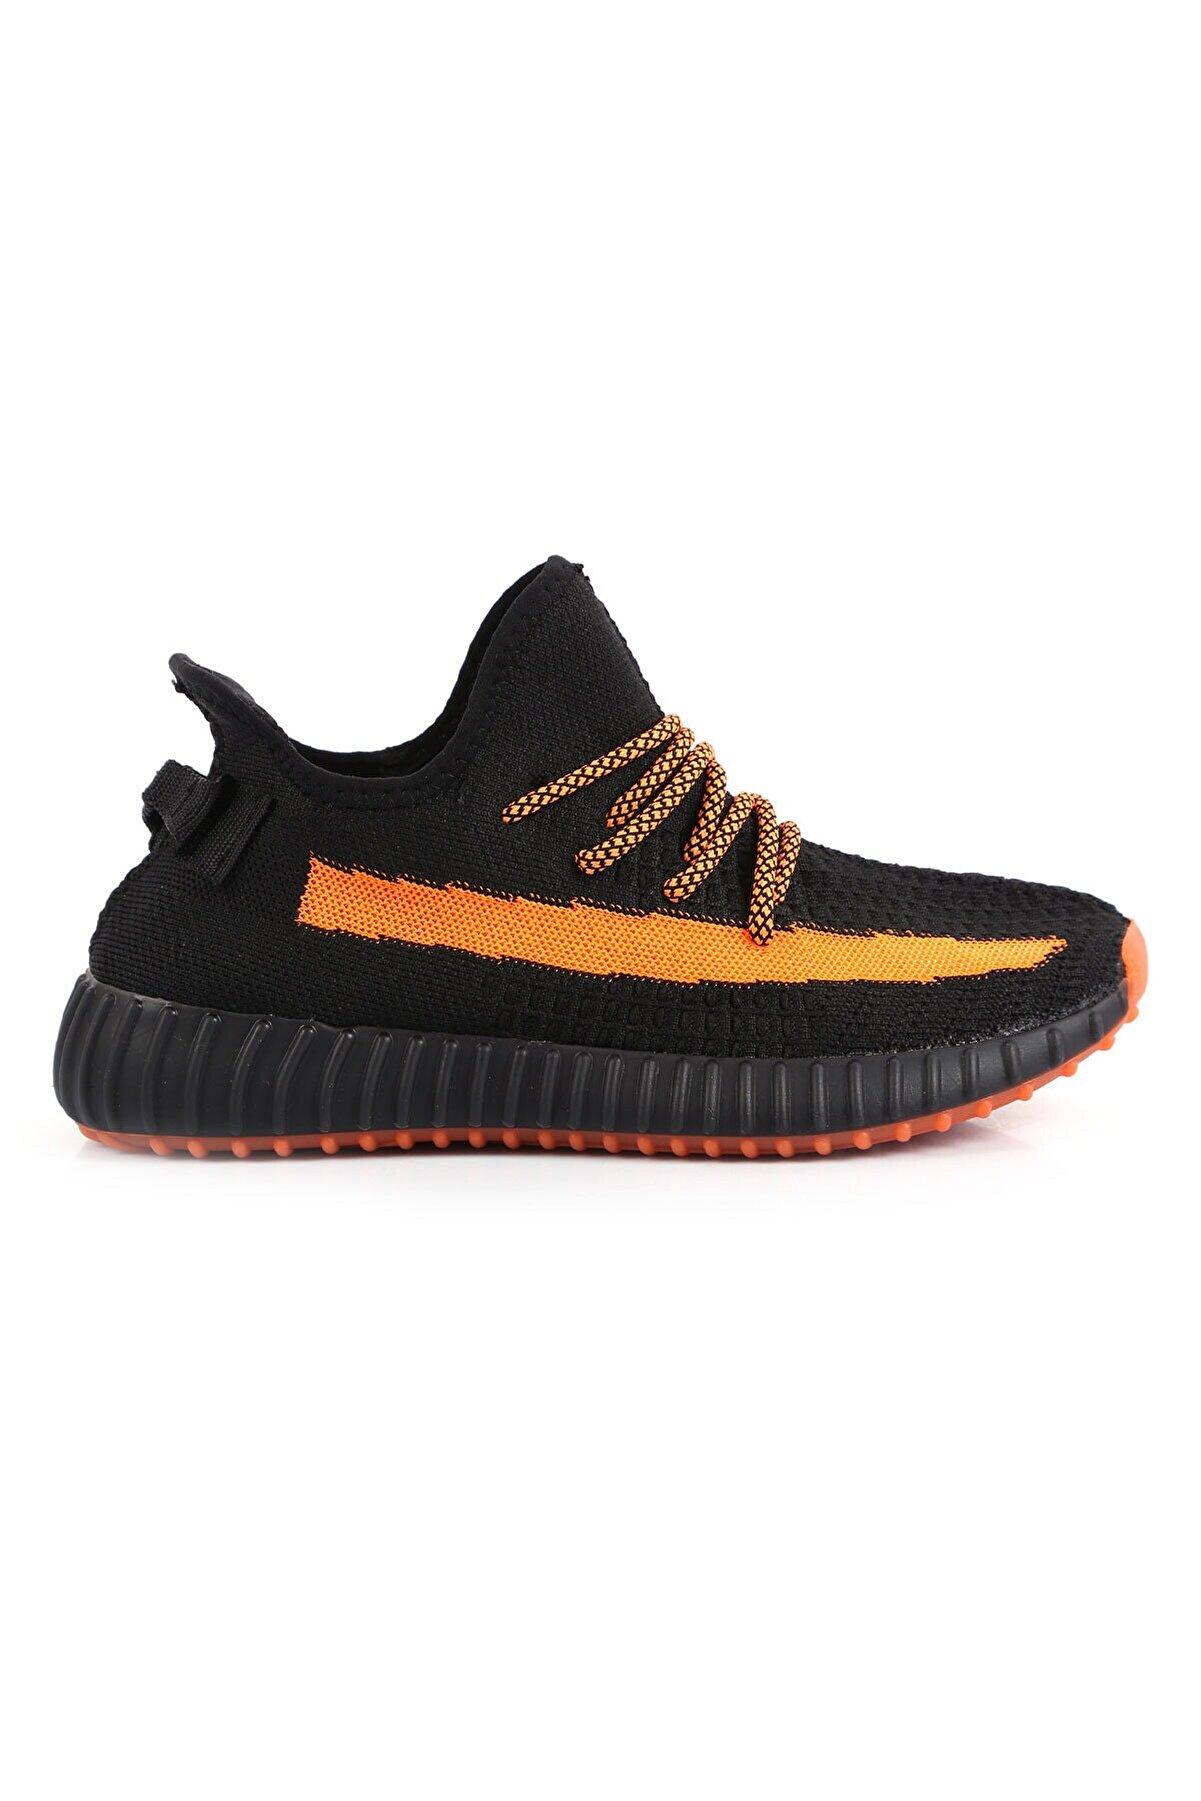 BLACK DEER Siyah Turuncu Runner Ortopedik Yazlık Sneaker Ayakkabı